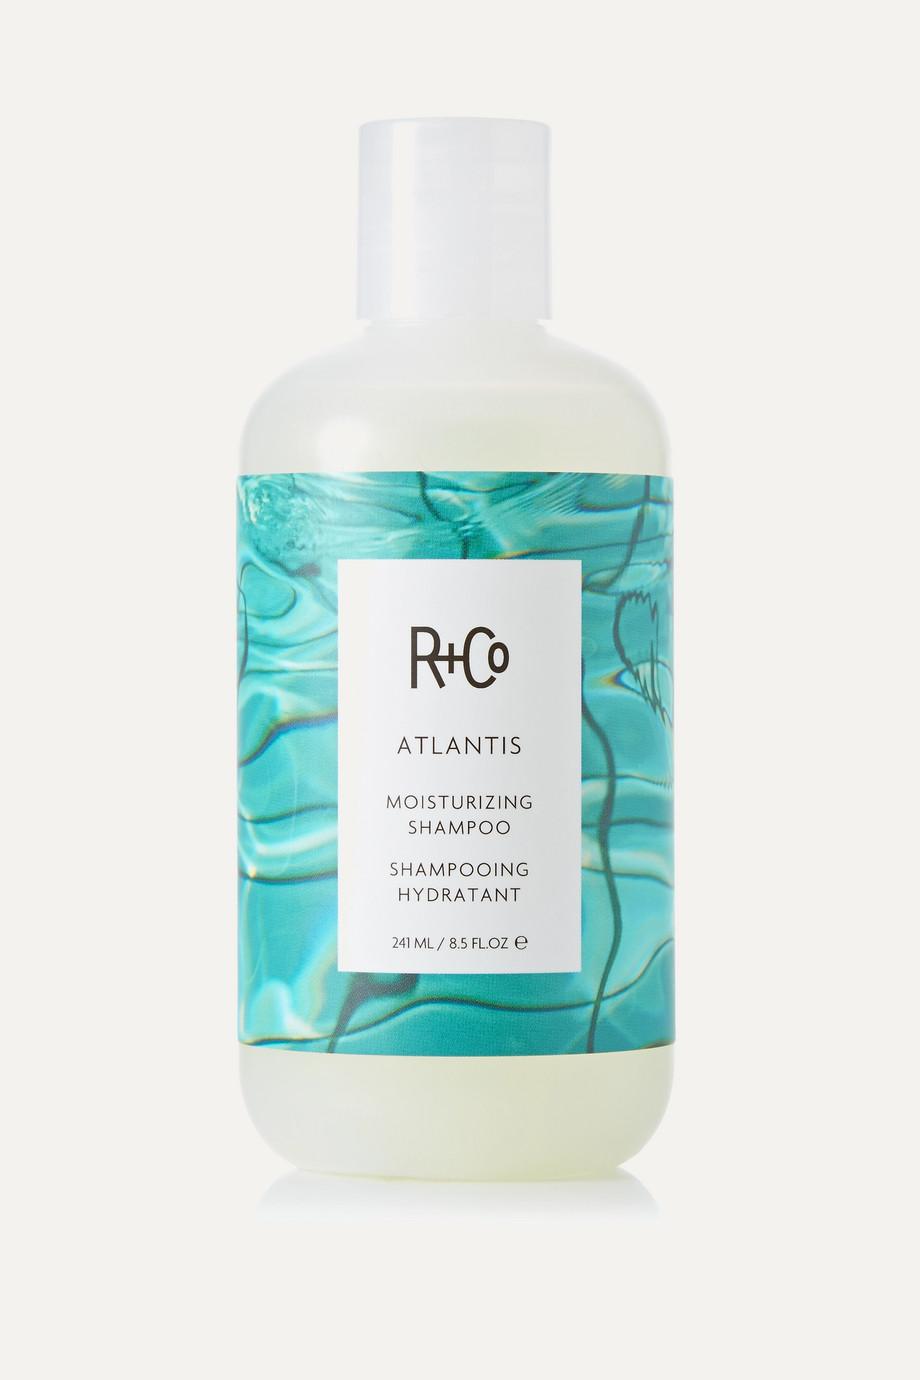 R+Co Atlantis Moisturizing Shampoo, 241ml